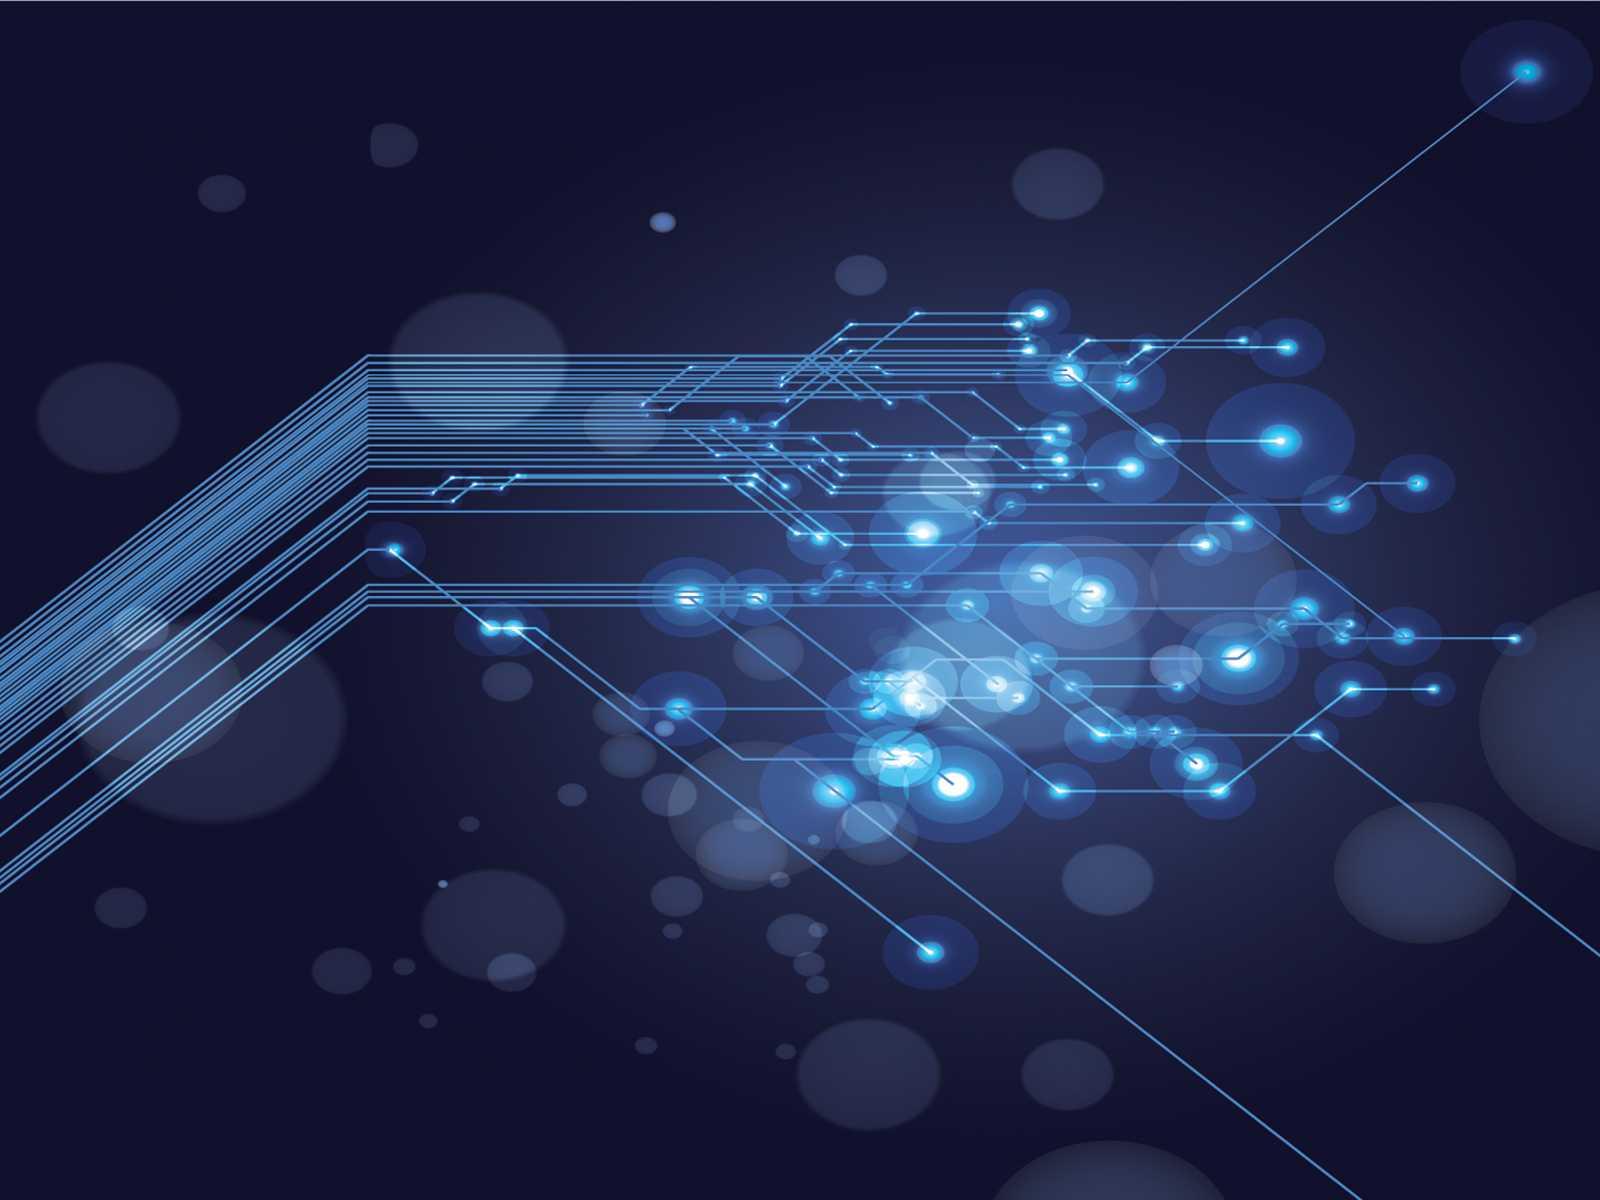 Technology Design Powerpoint Templates - Black, Blue pertaining to High Tech Powerpoint Template